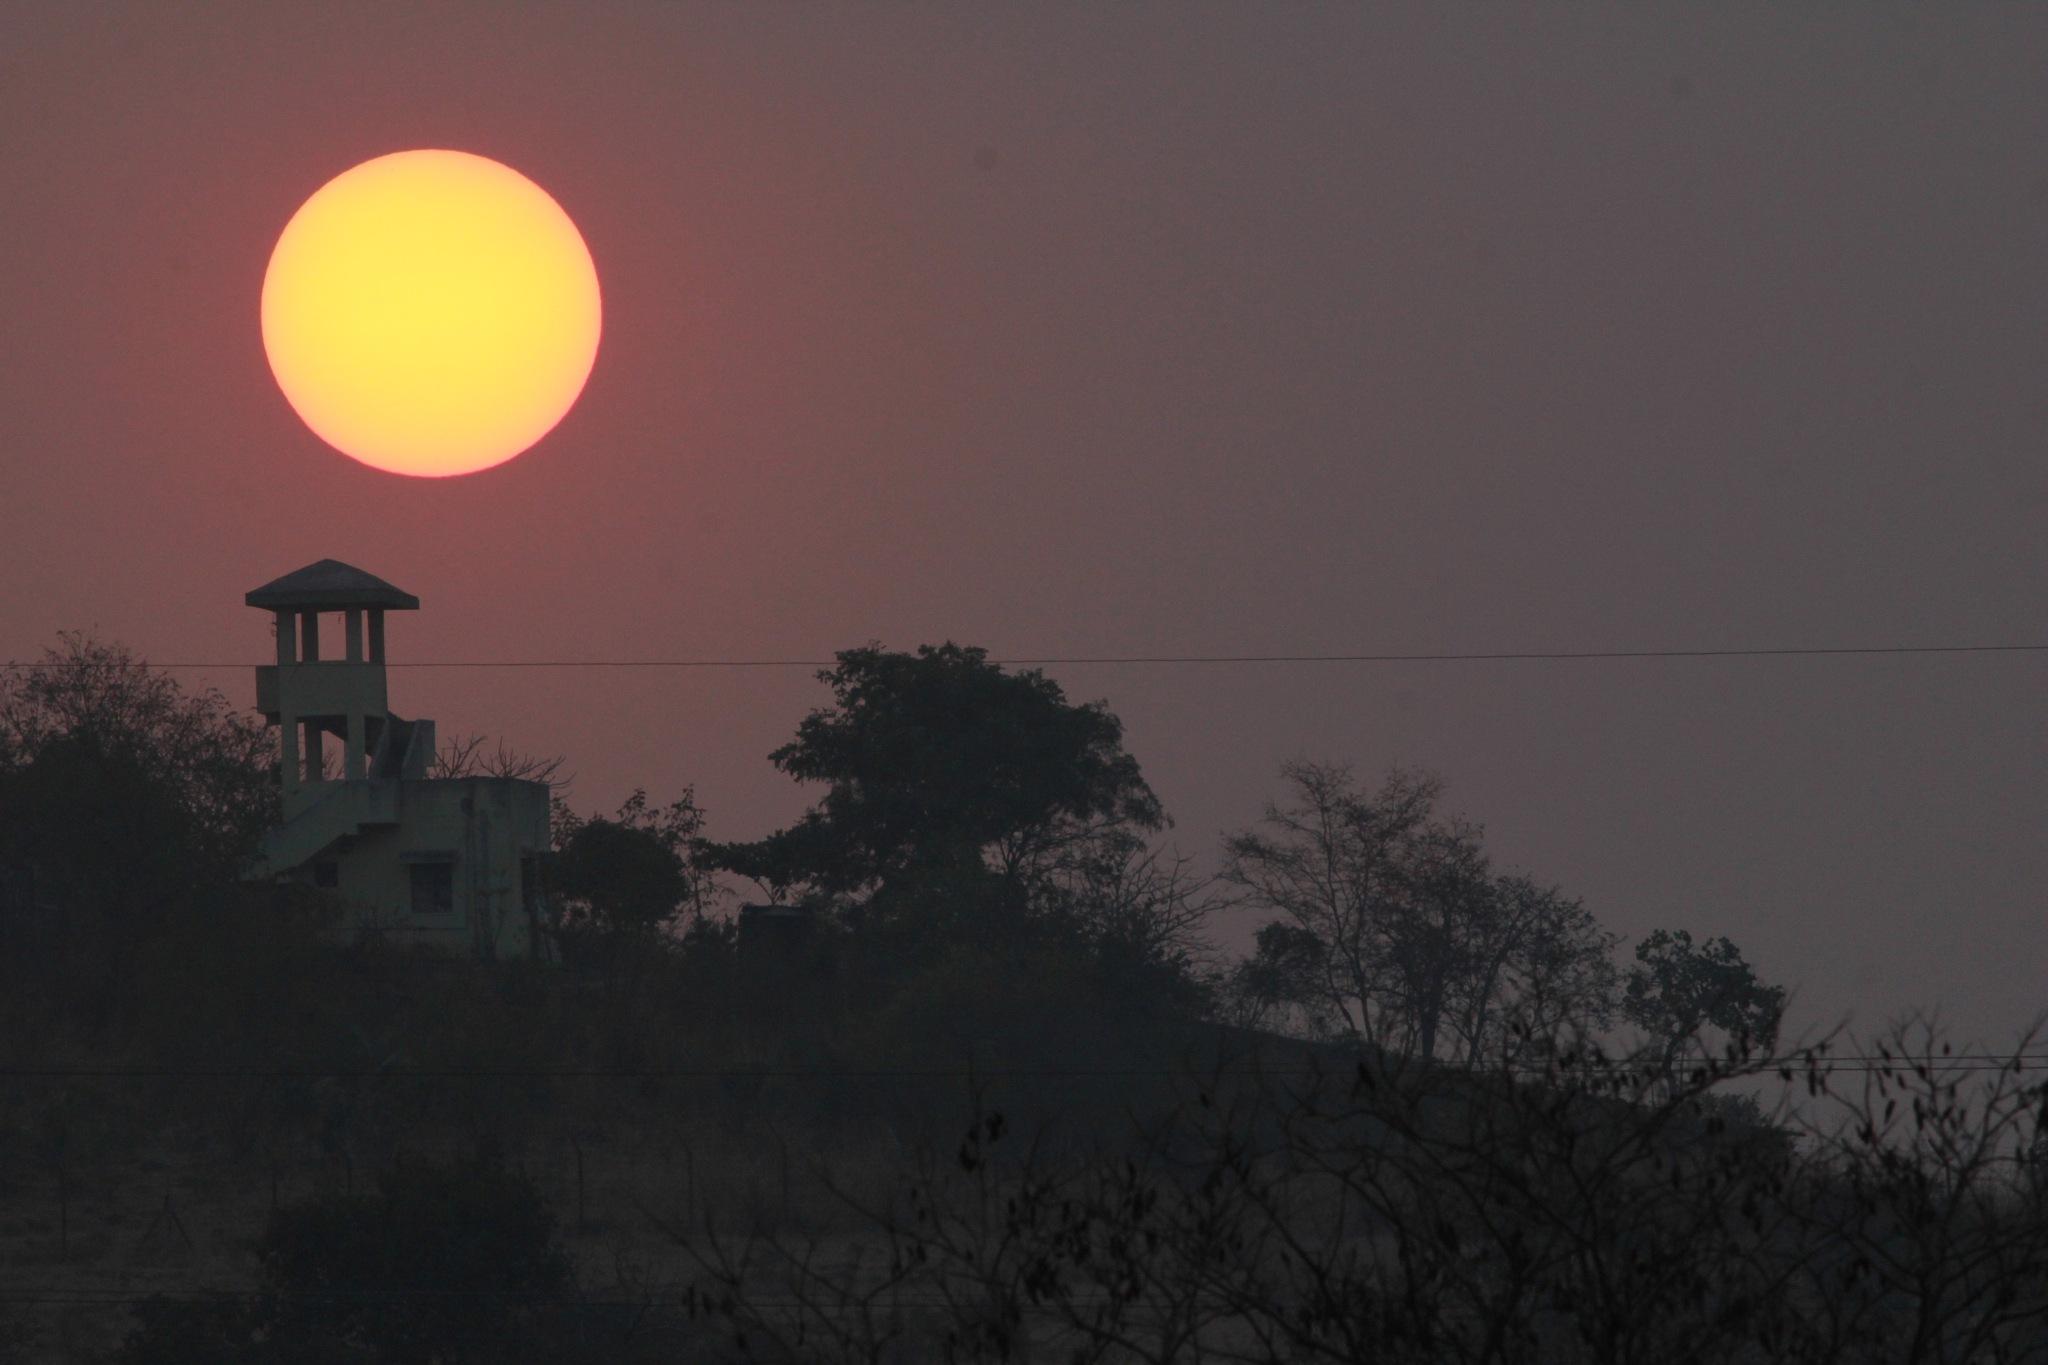 Evening Hues! by Surekha Pillai